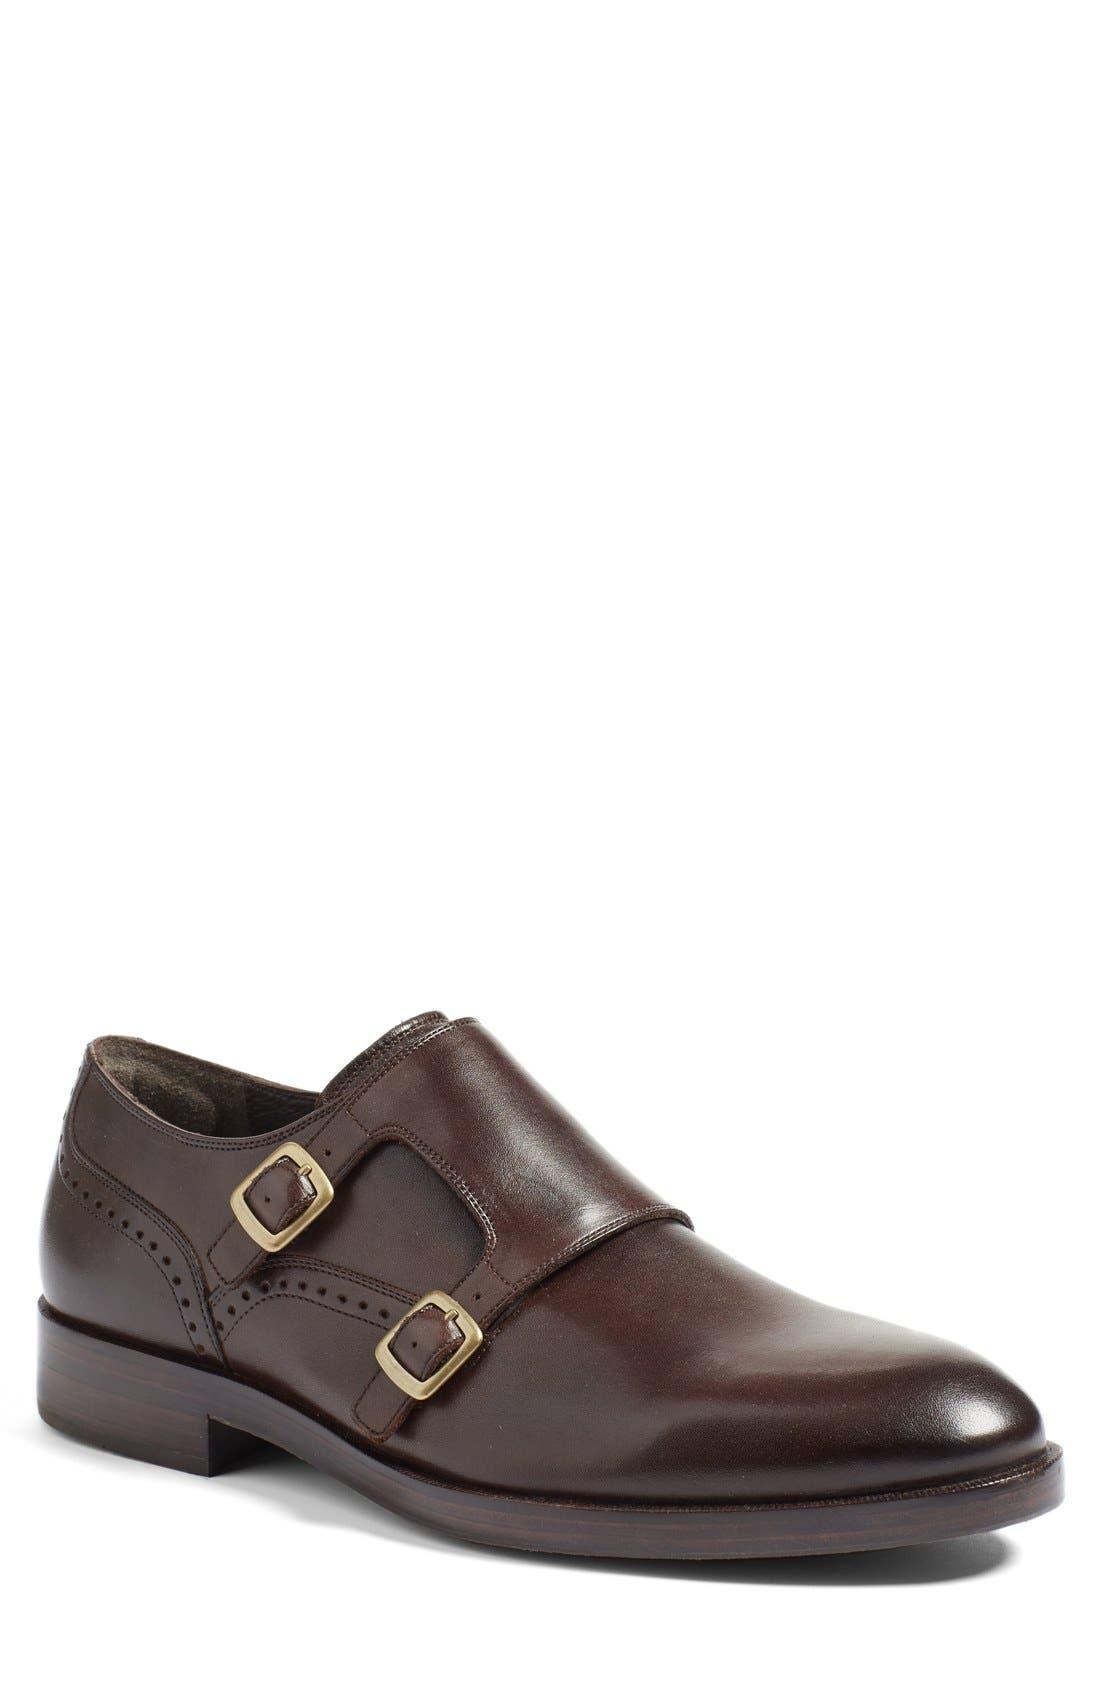 Alternate Image 1 Selected - Cole Haan 'Harrison' Double Monk Strap Shoe (Men)